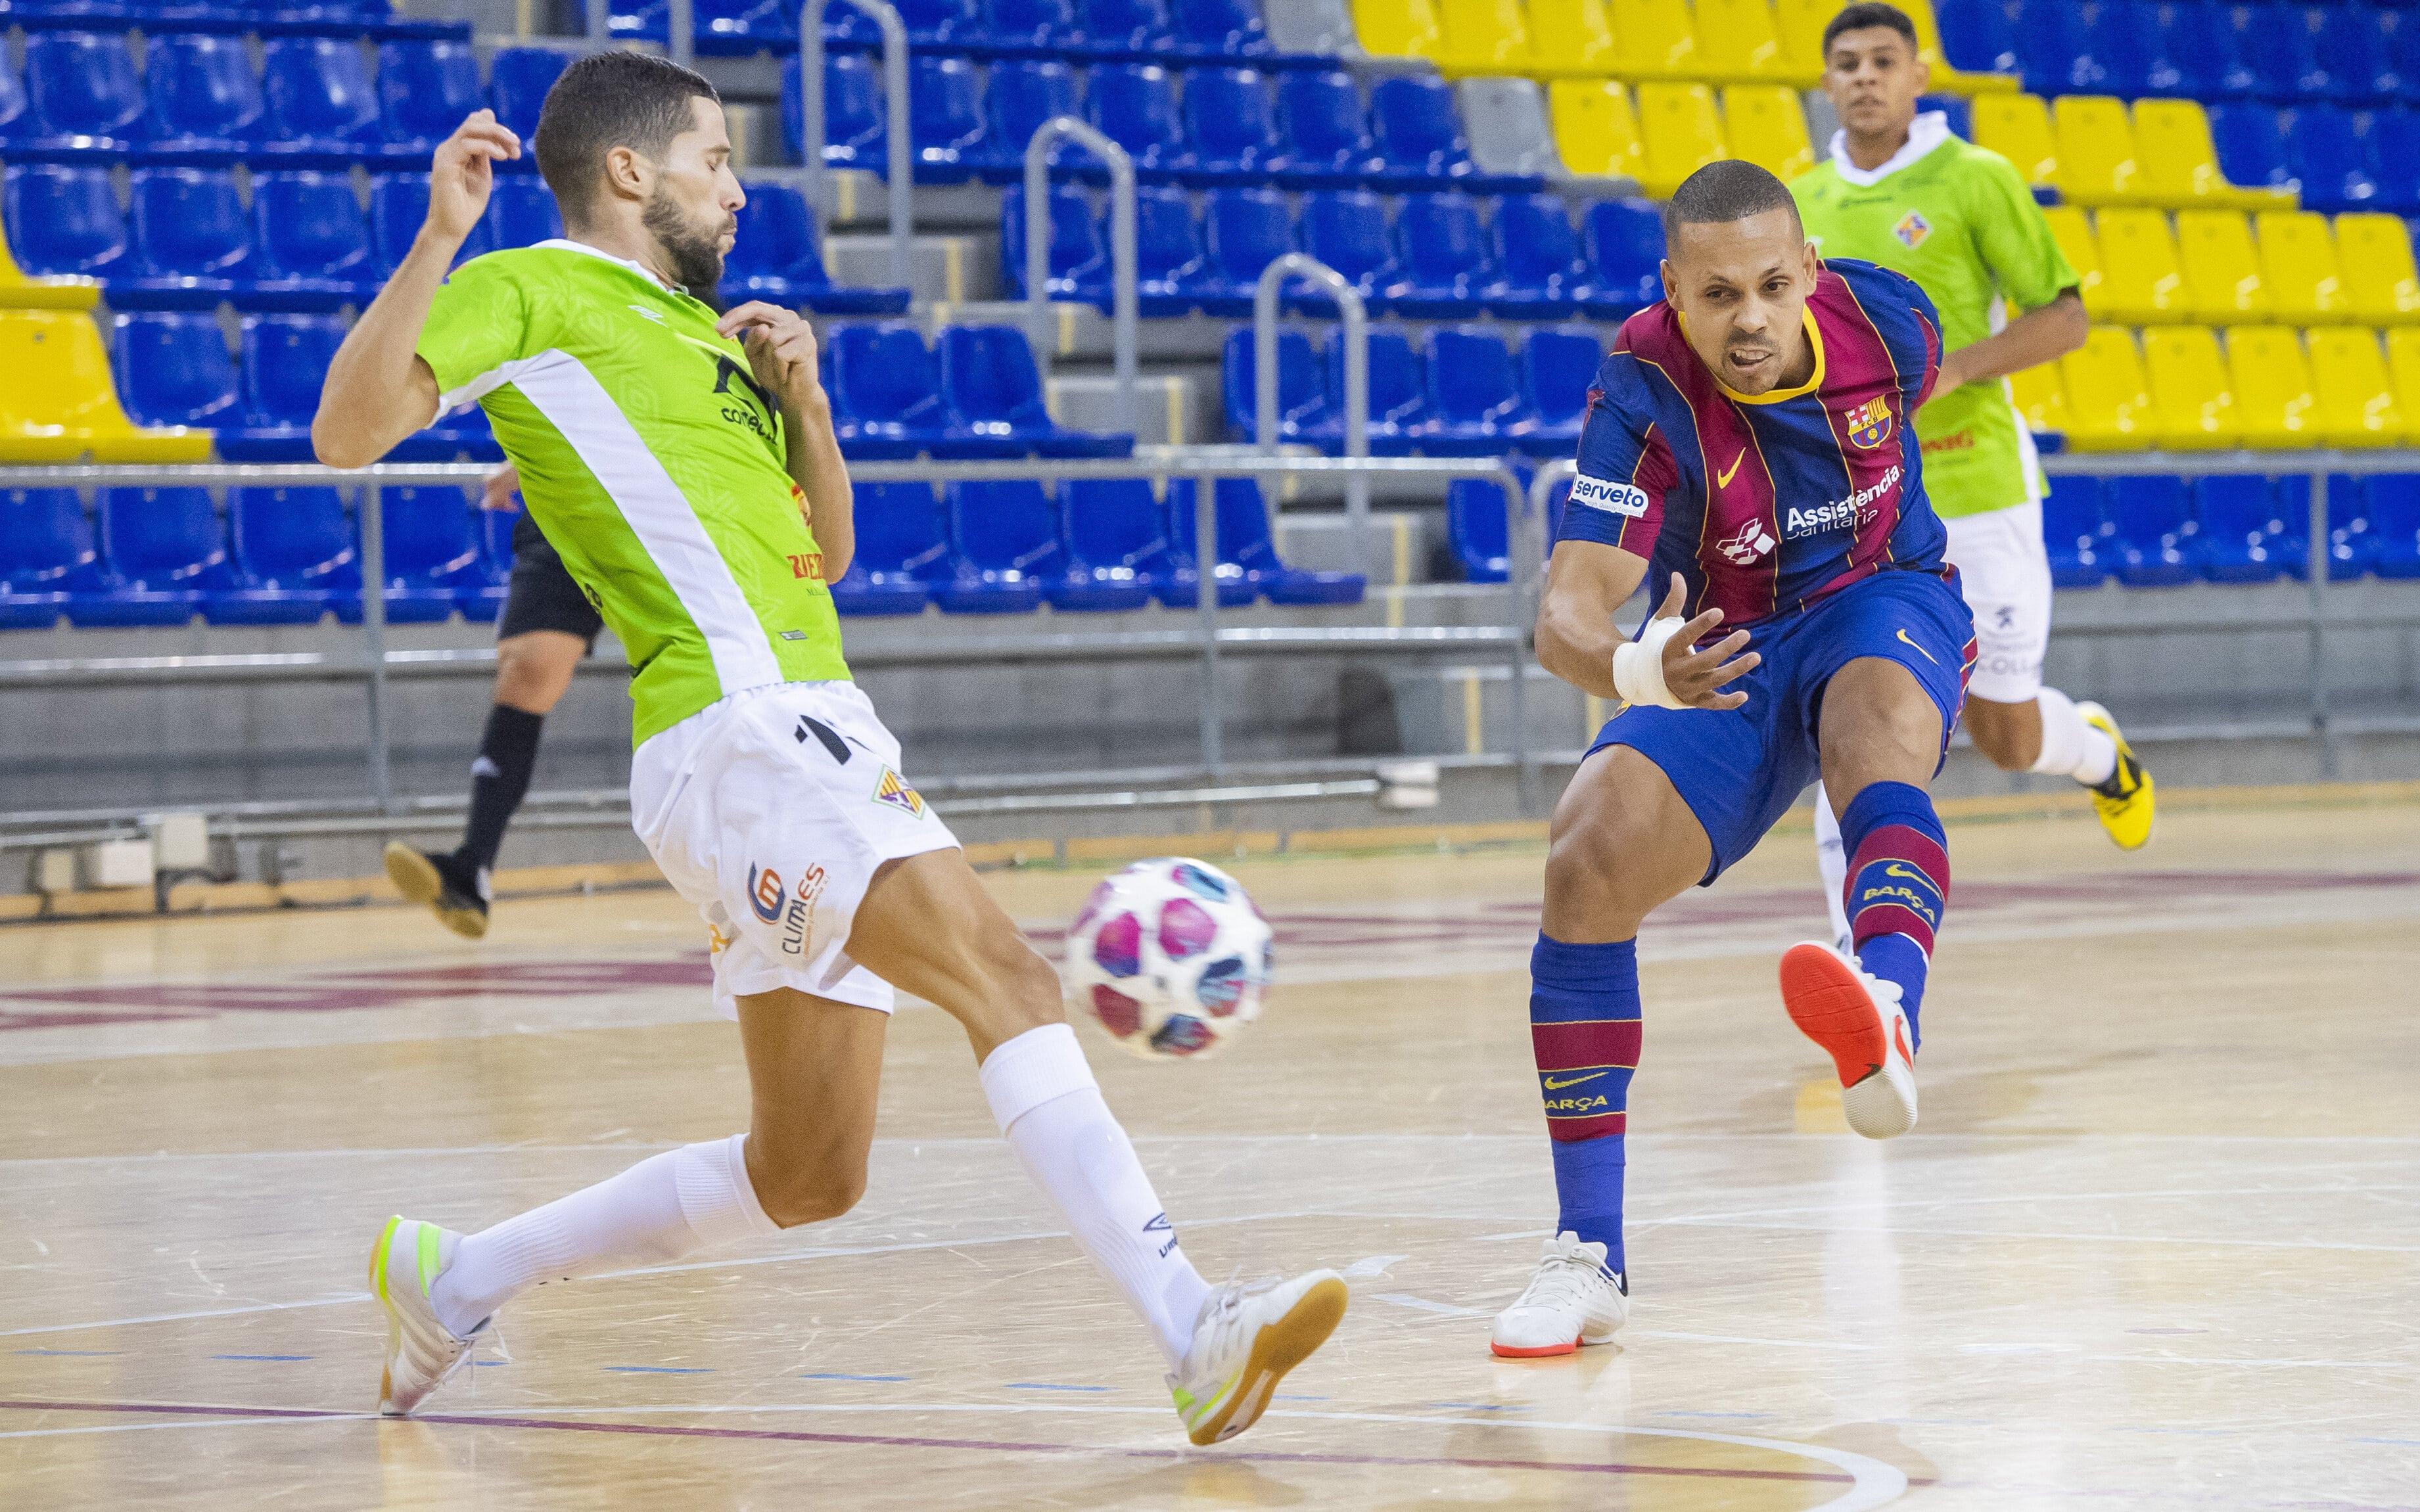 PREVIA | Palma Futsal – Barça: Duelo de alto voltaje